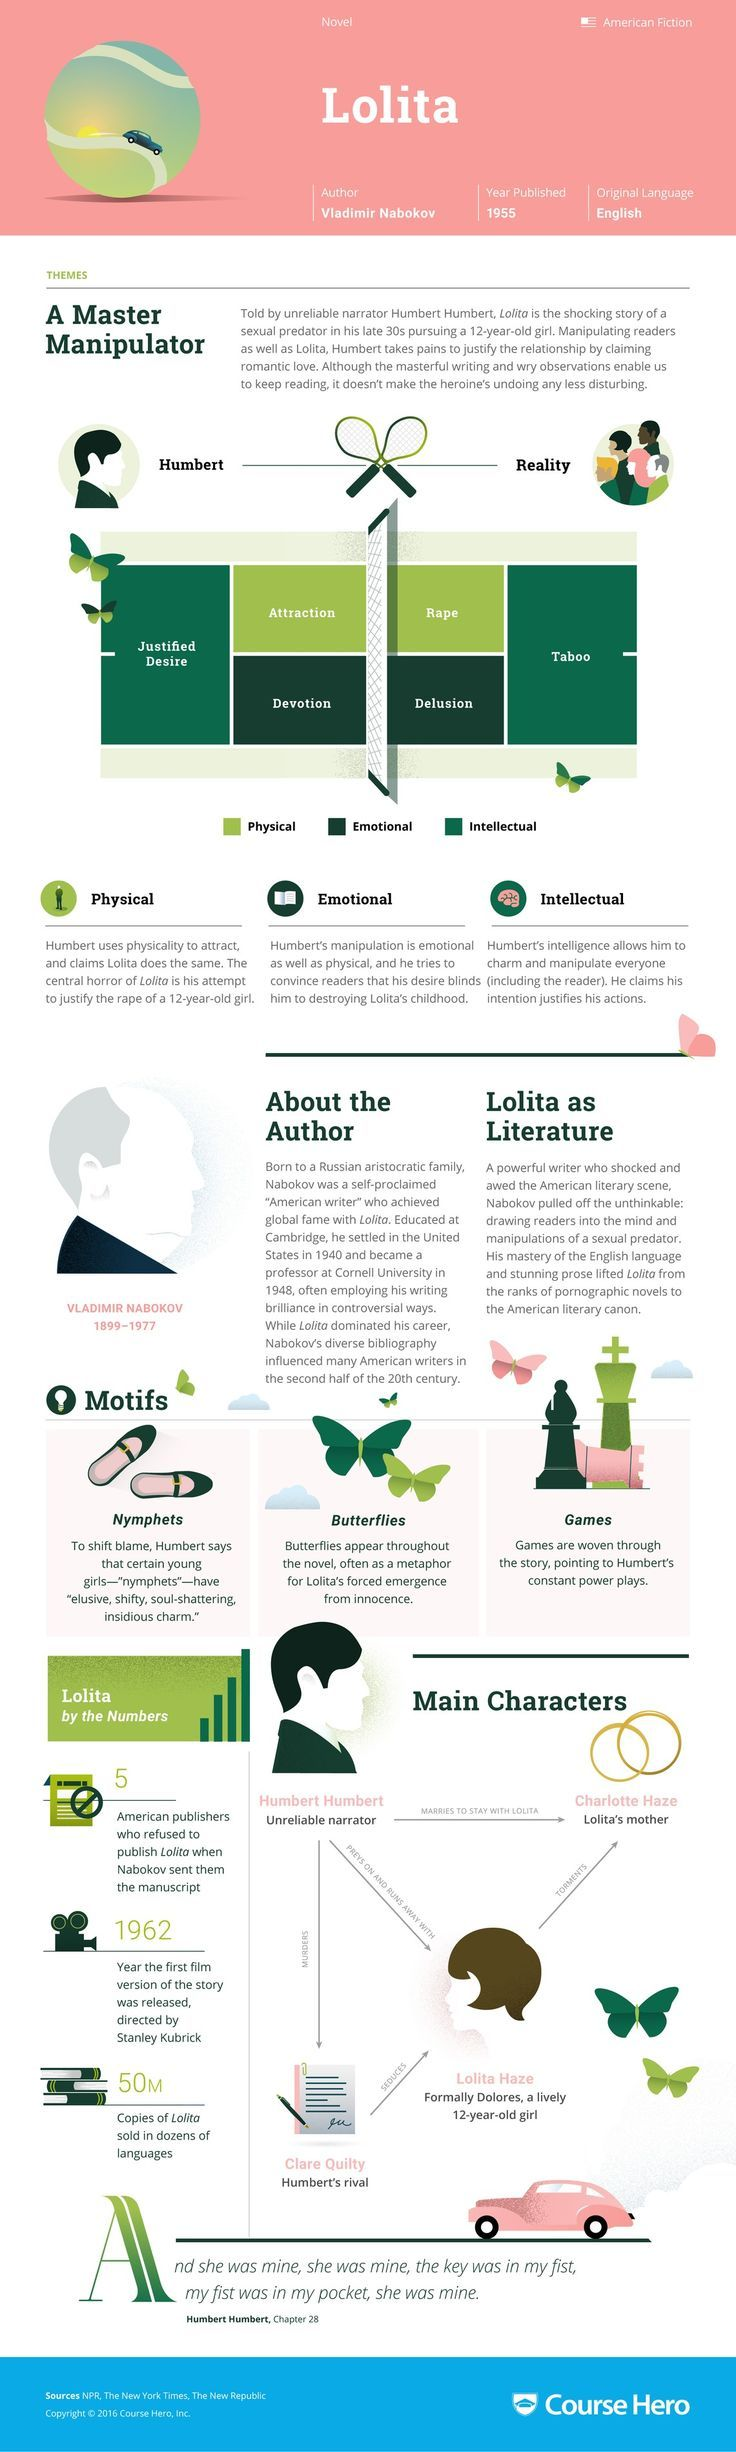 Lolita Infographic | Course Hero